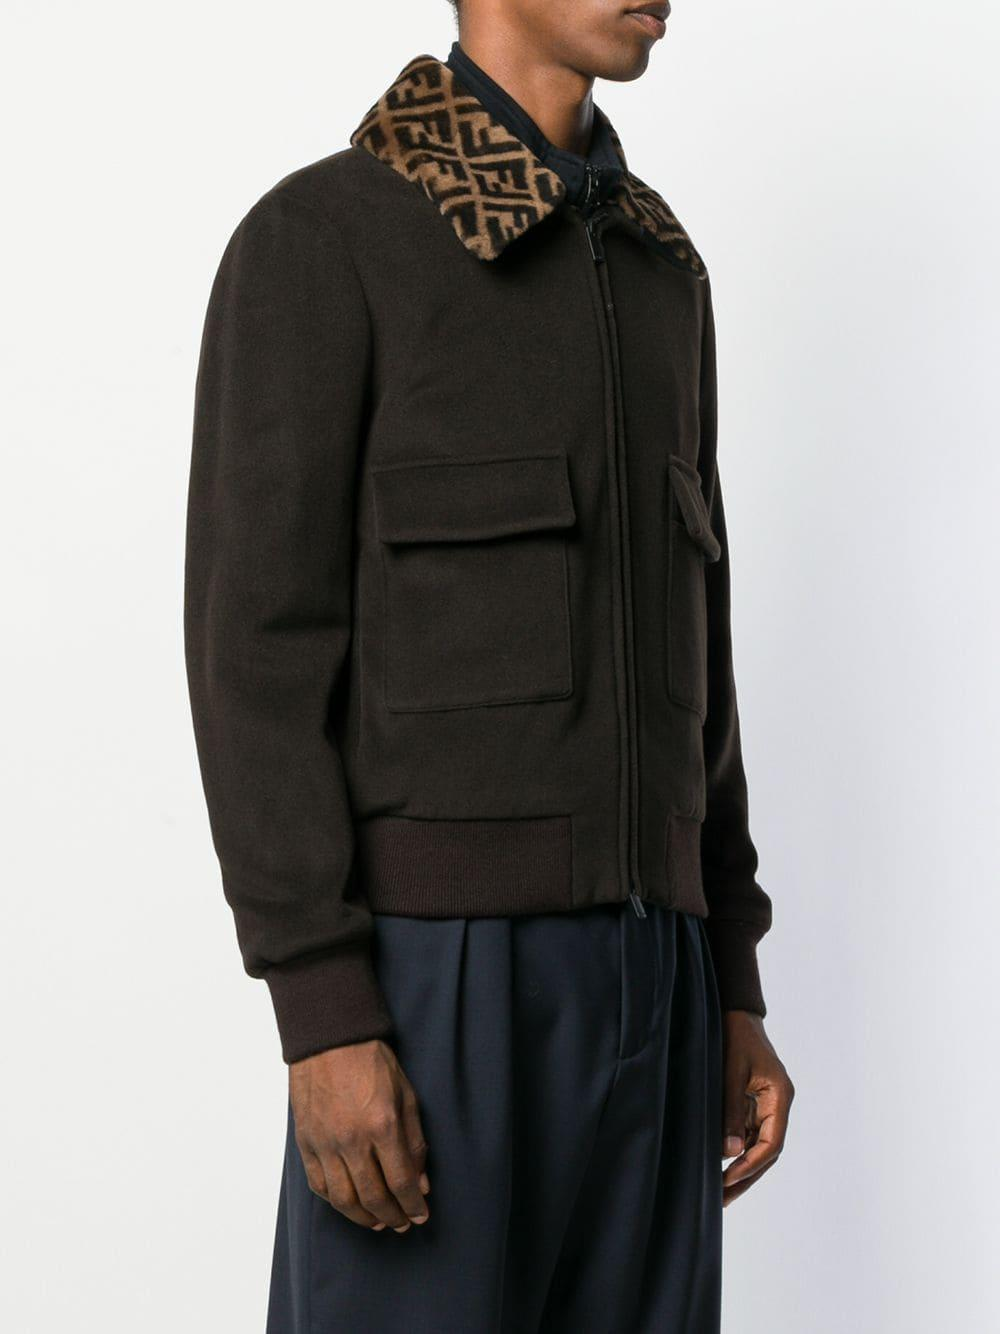 7ea64b903 Men's Brown Ff Collar Bomber Jacket